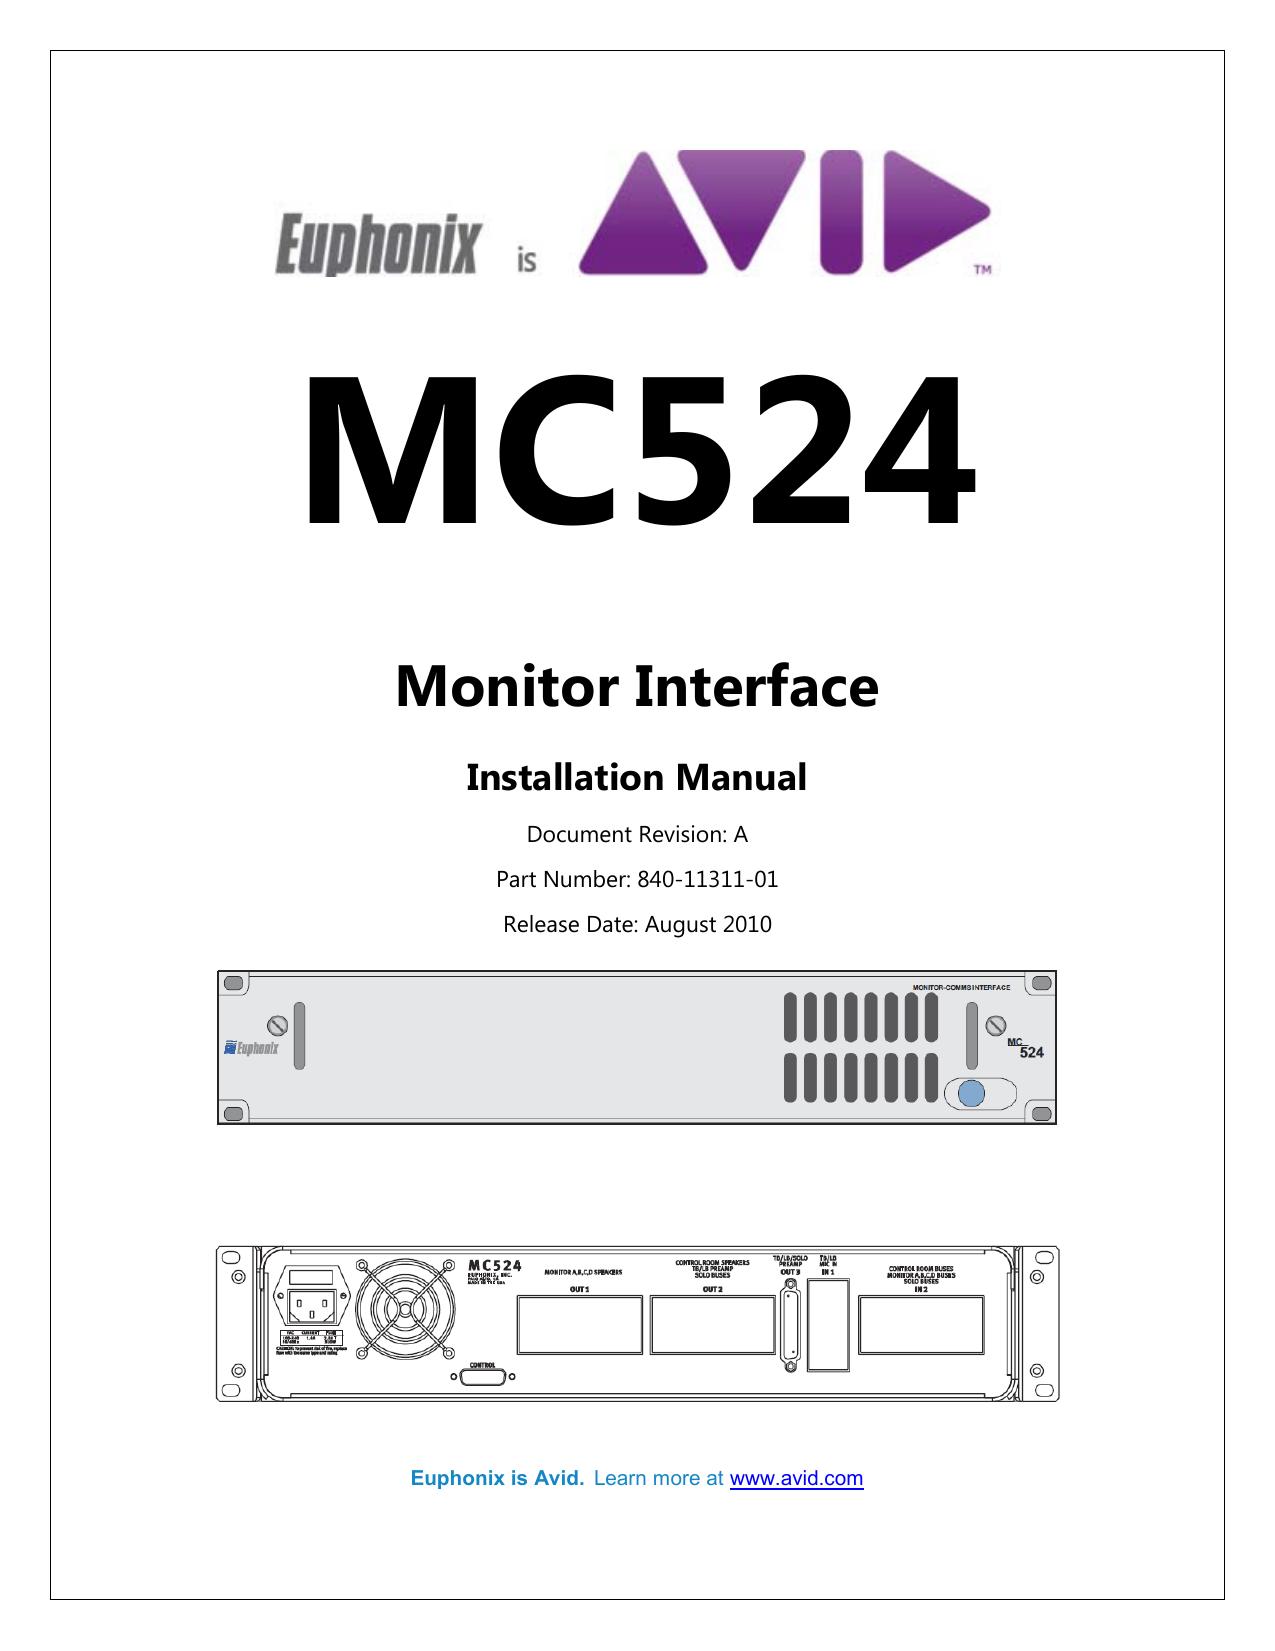 MC524 Monitor Interface Installation Manual